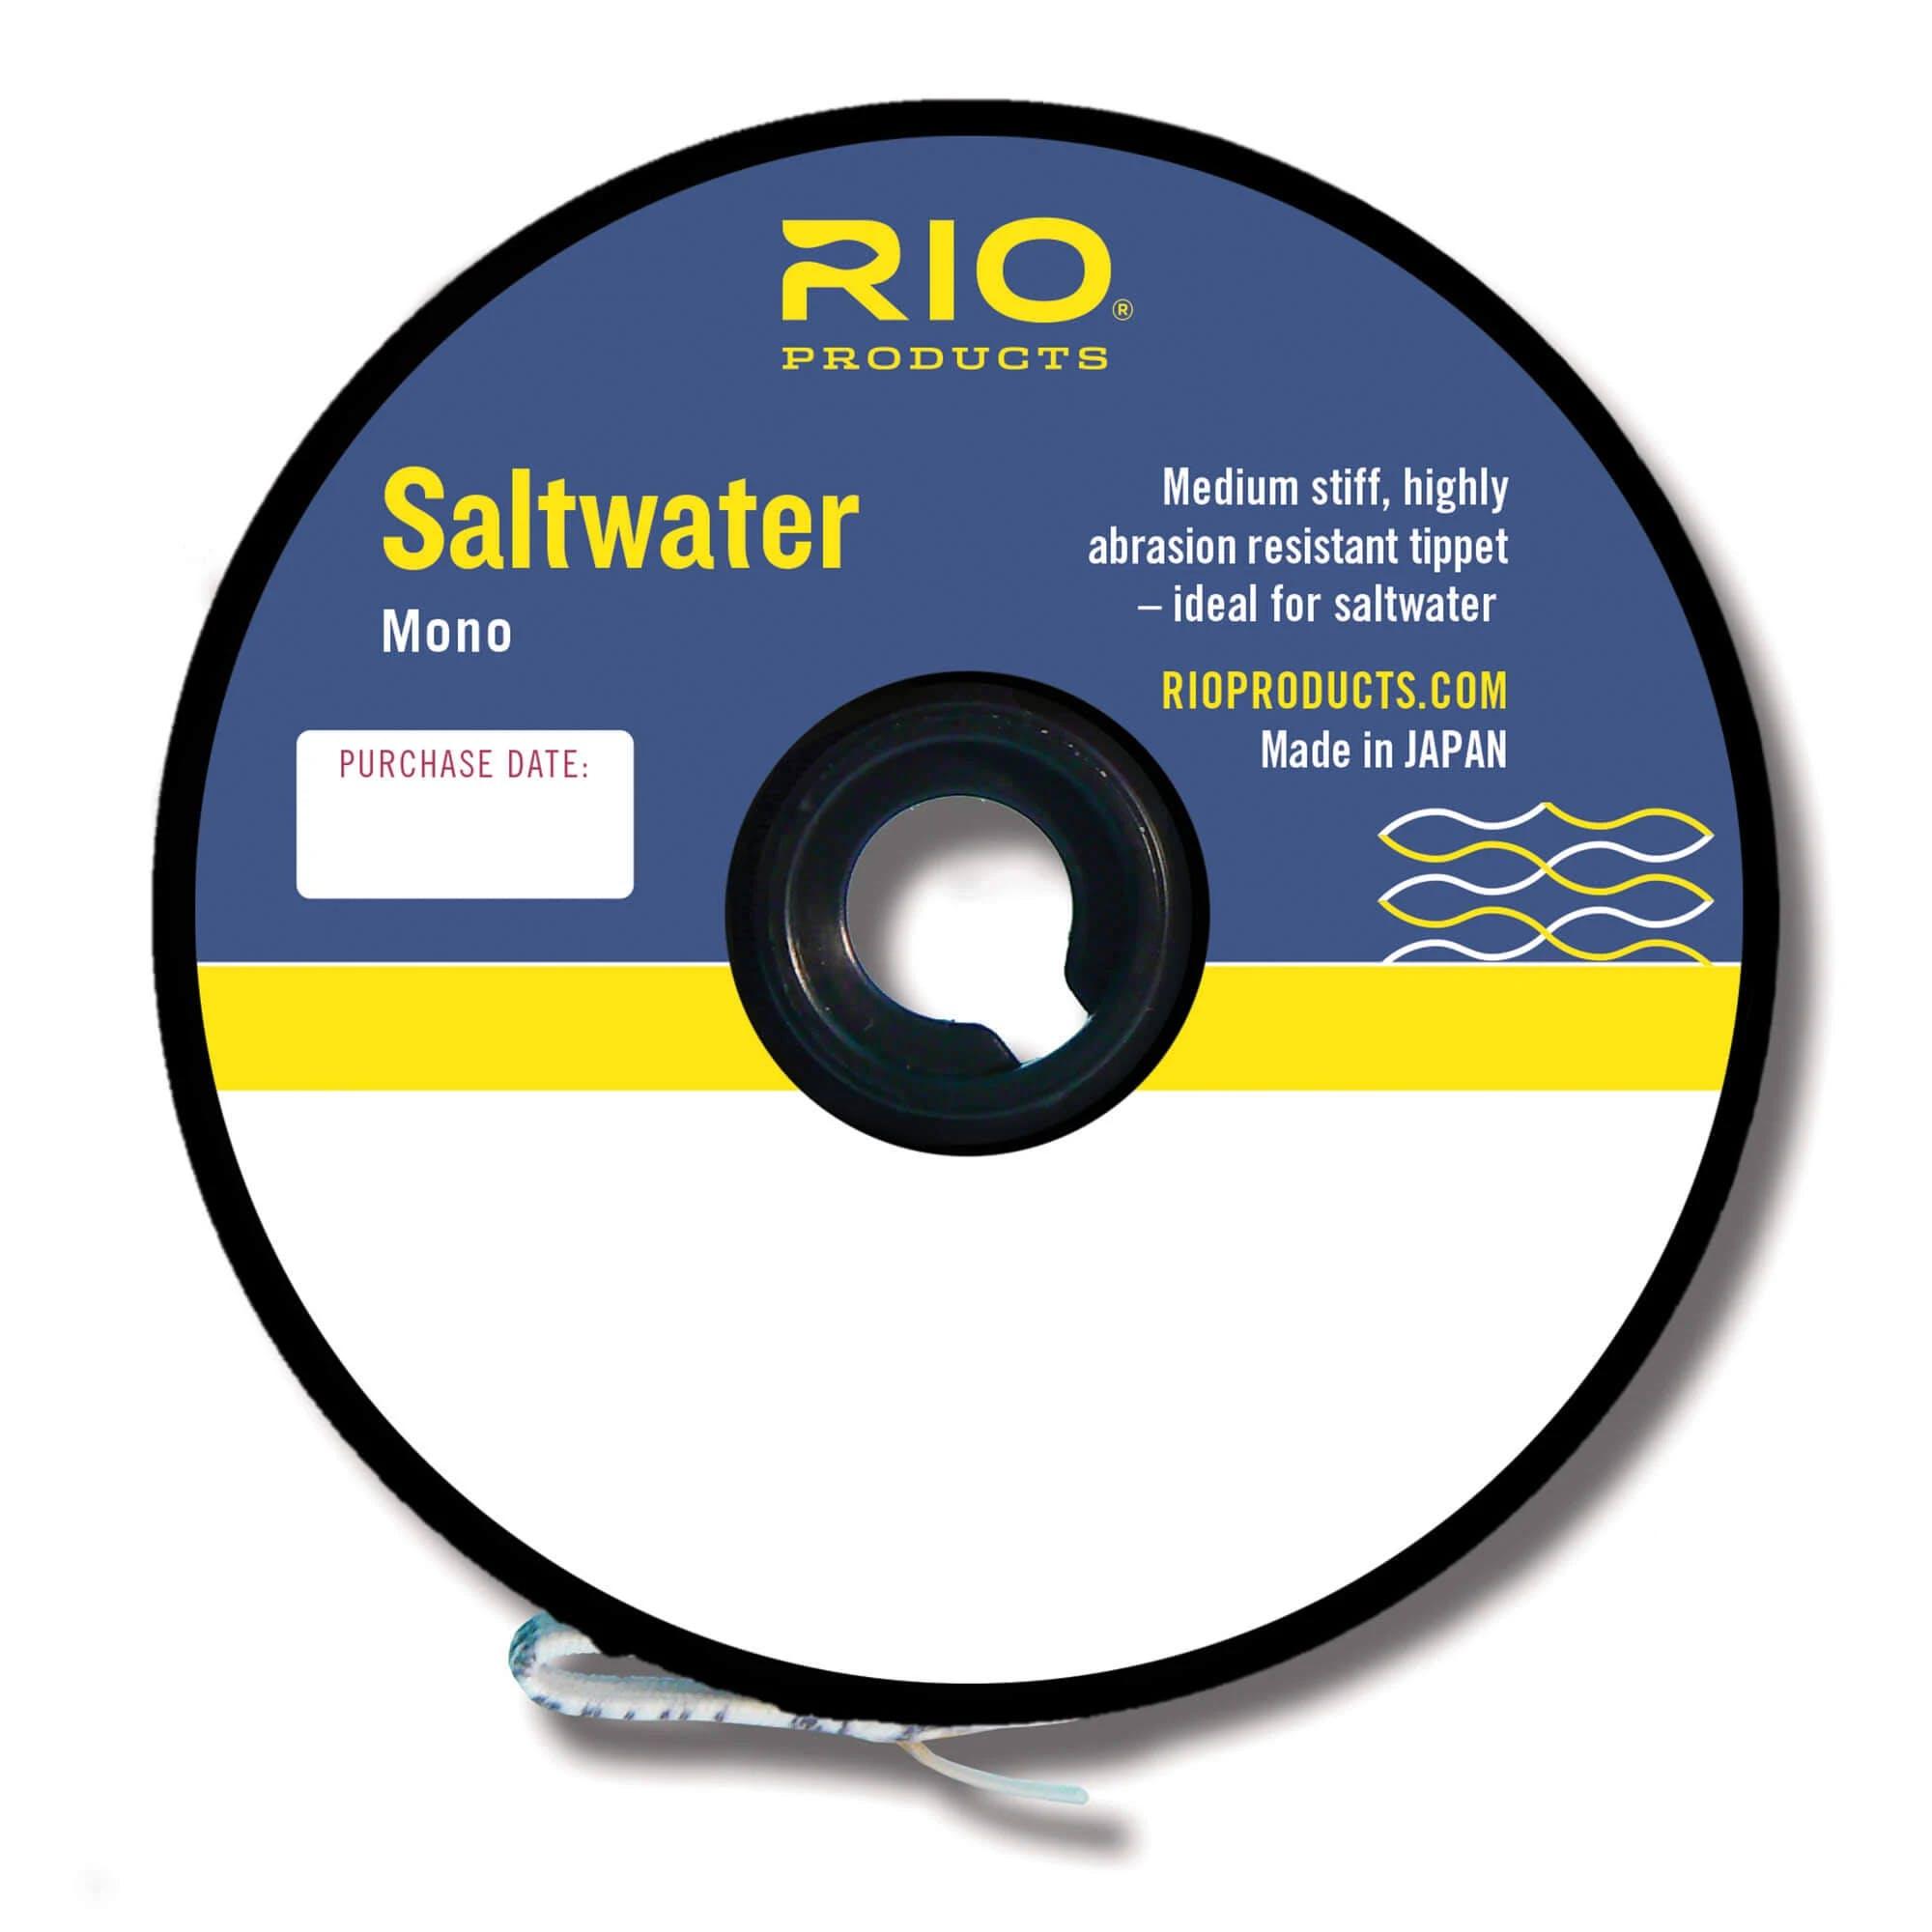 Rio Saltwater Mono Tippet 50lb